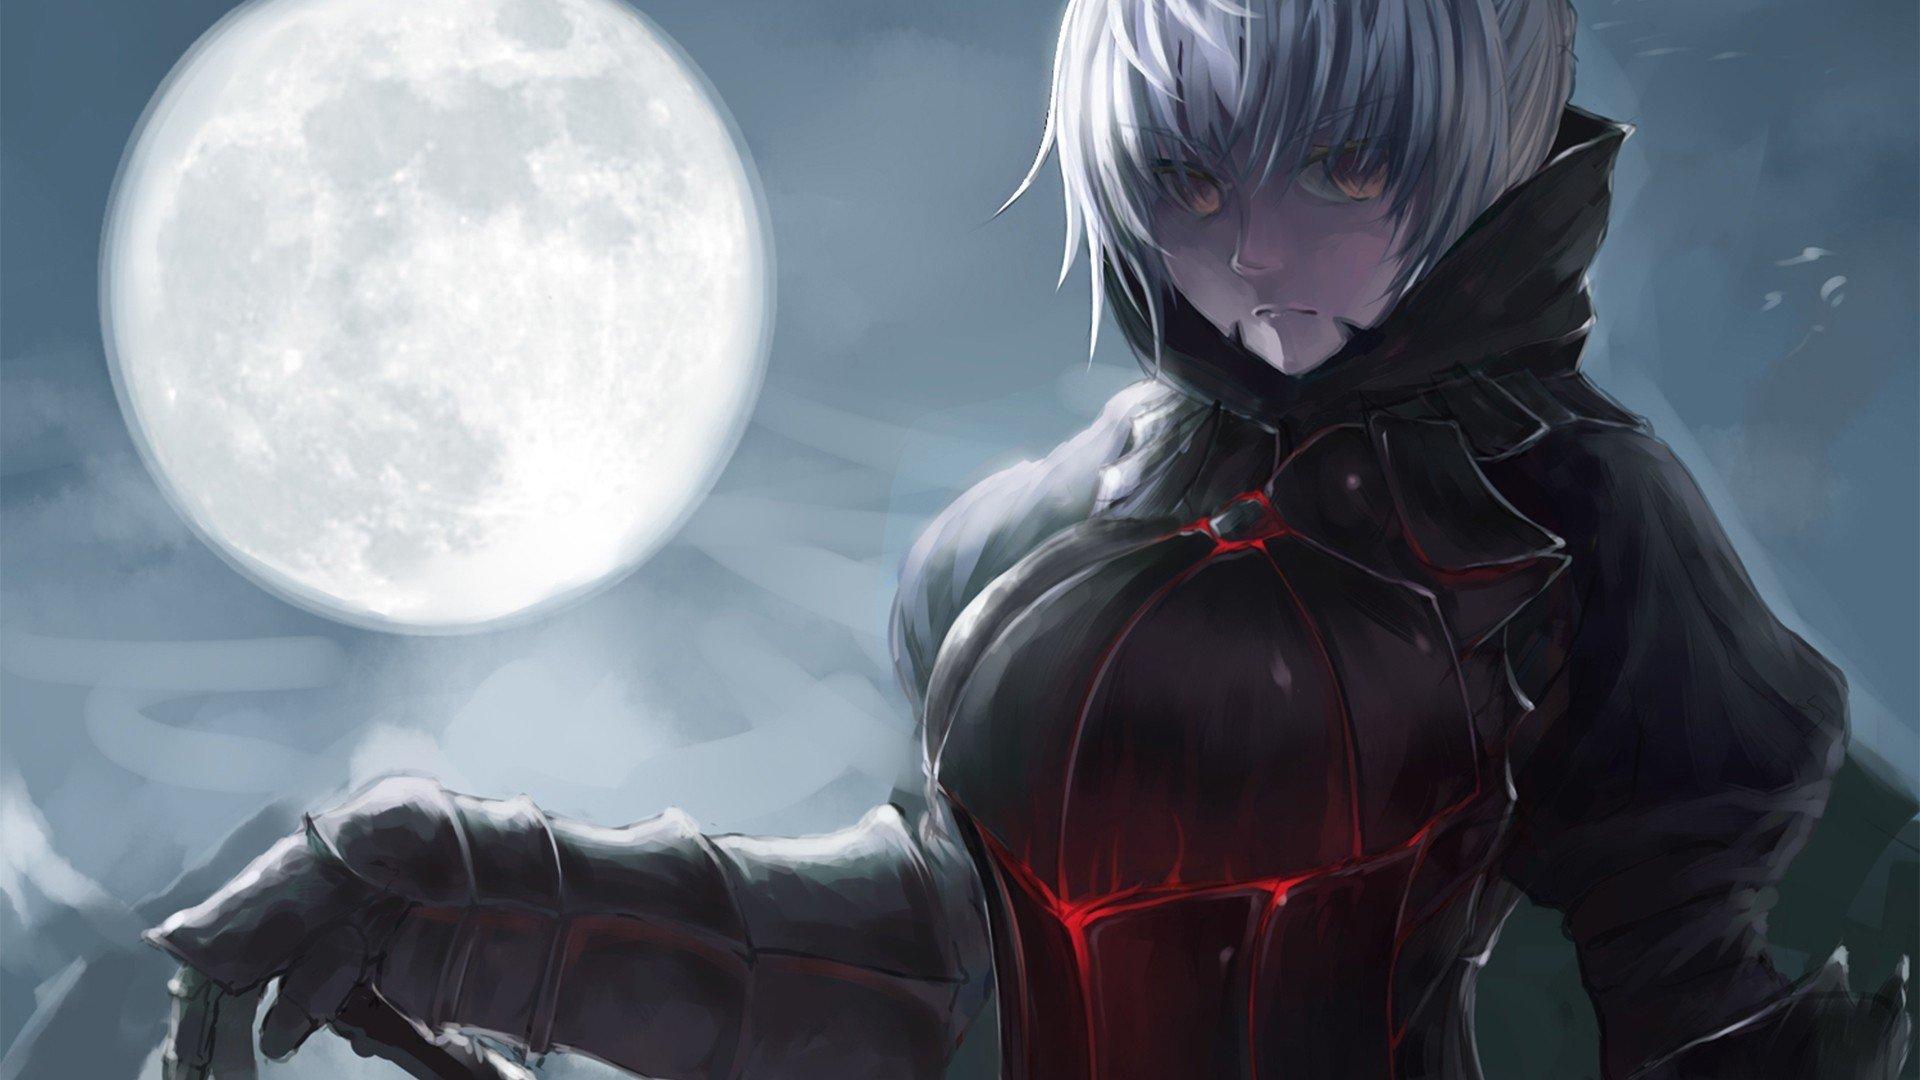 Evil Dark Spirit Girl Wallpaper Hd Fate Stay Night Hd Wallpaper Background Image